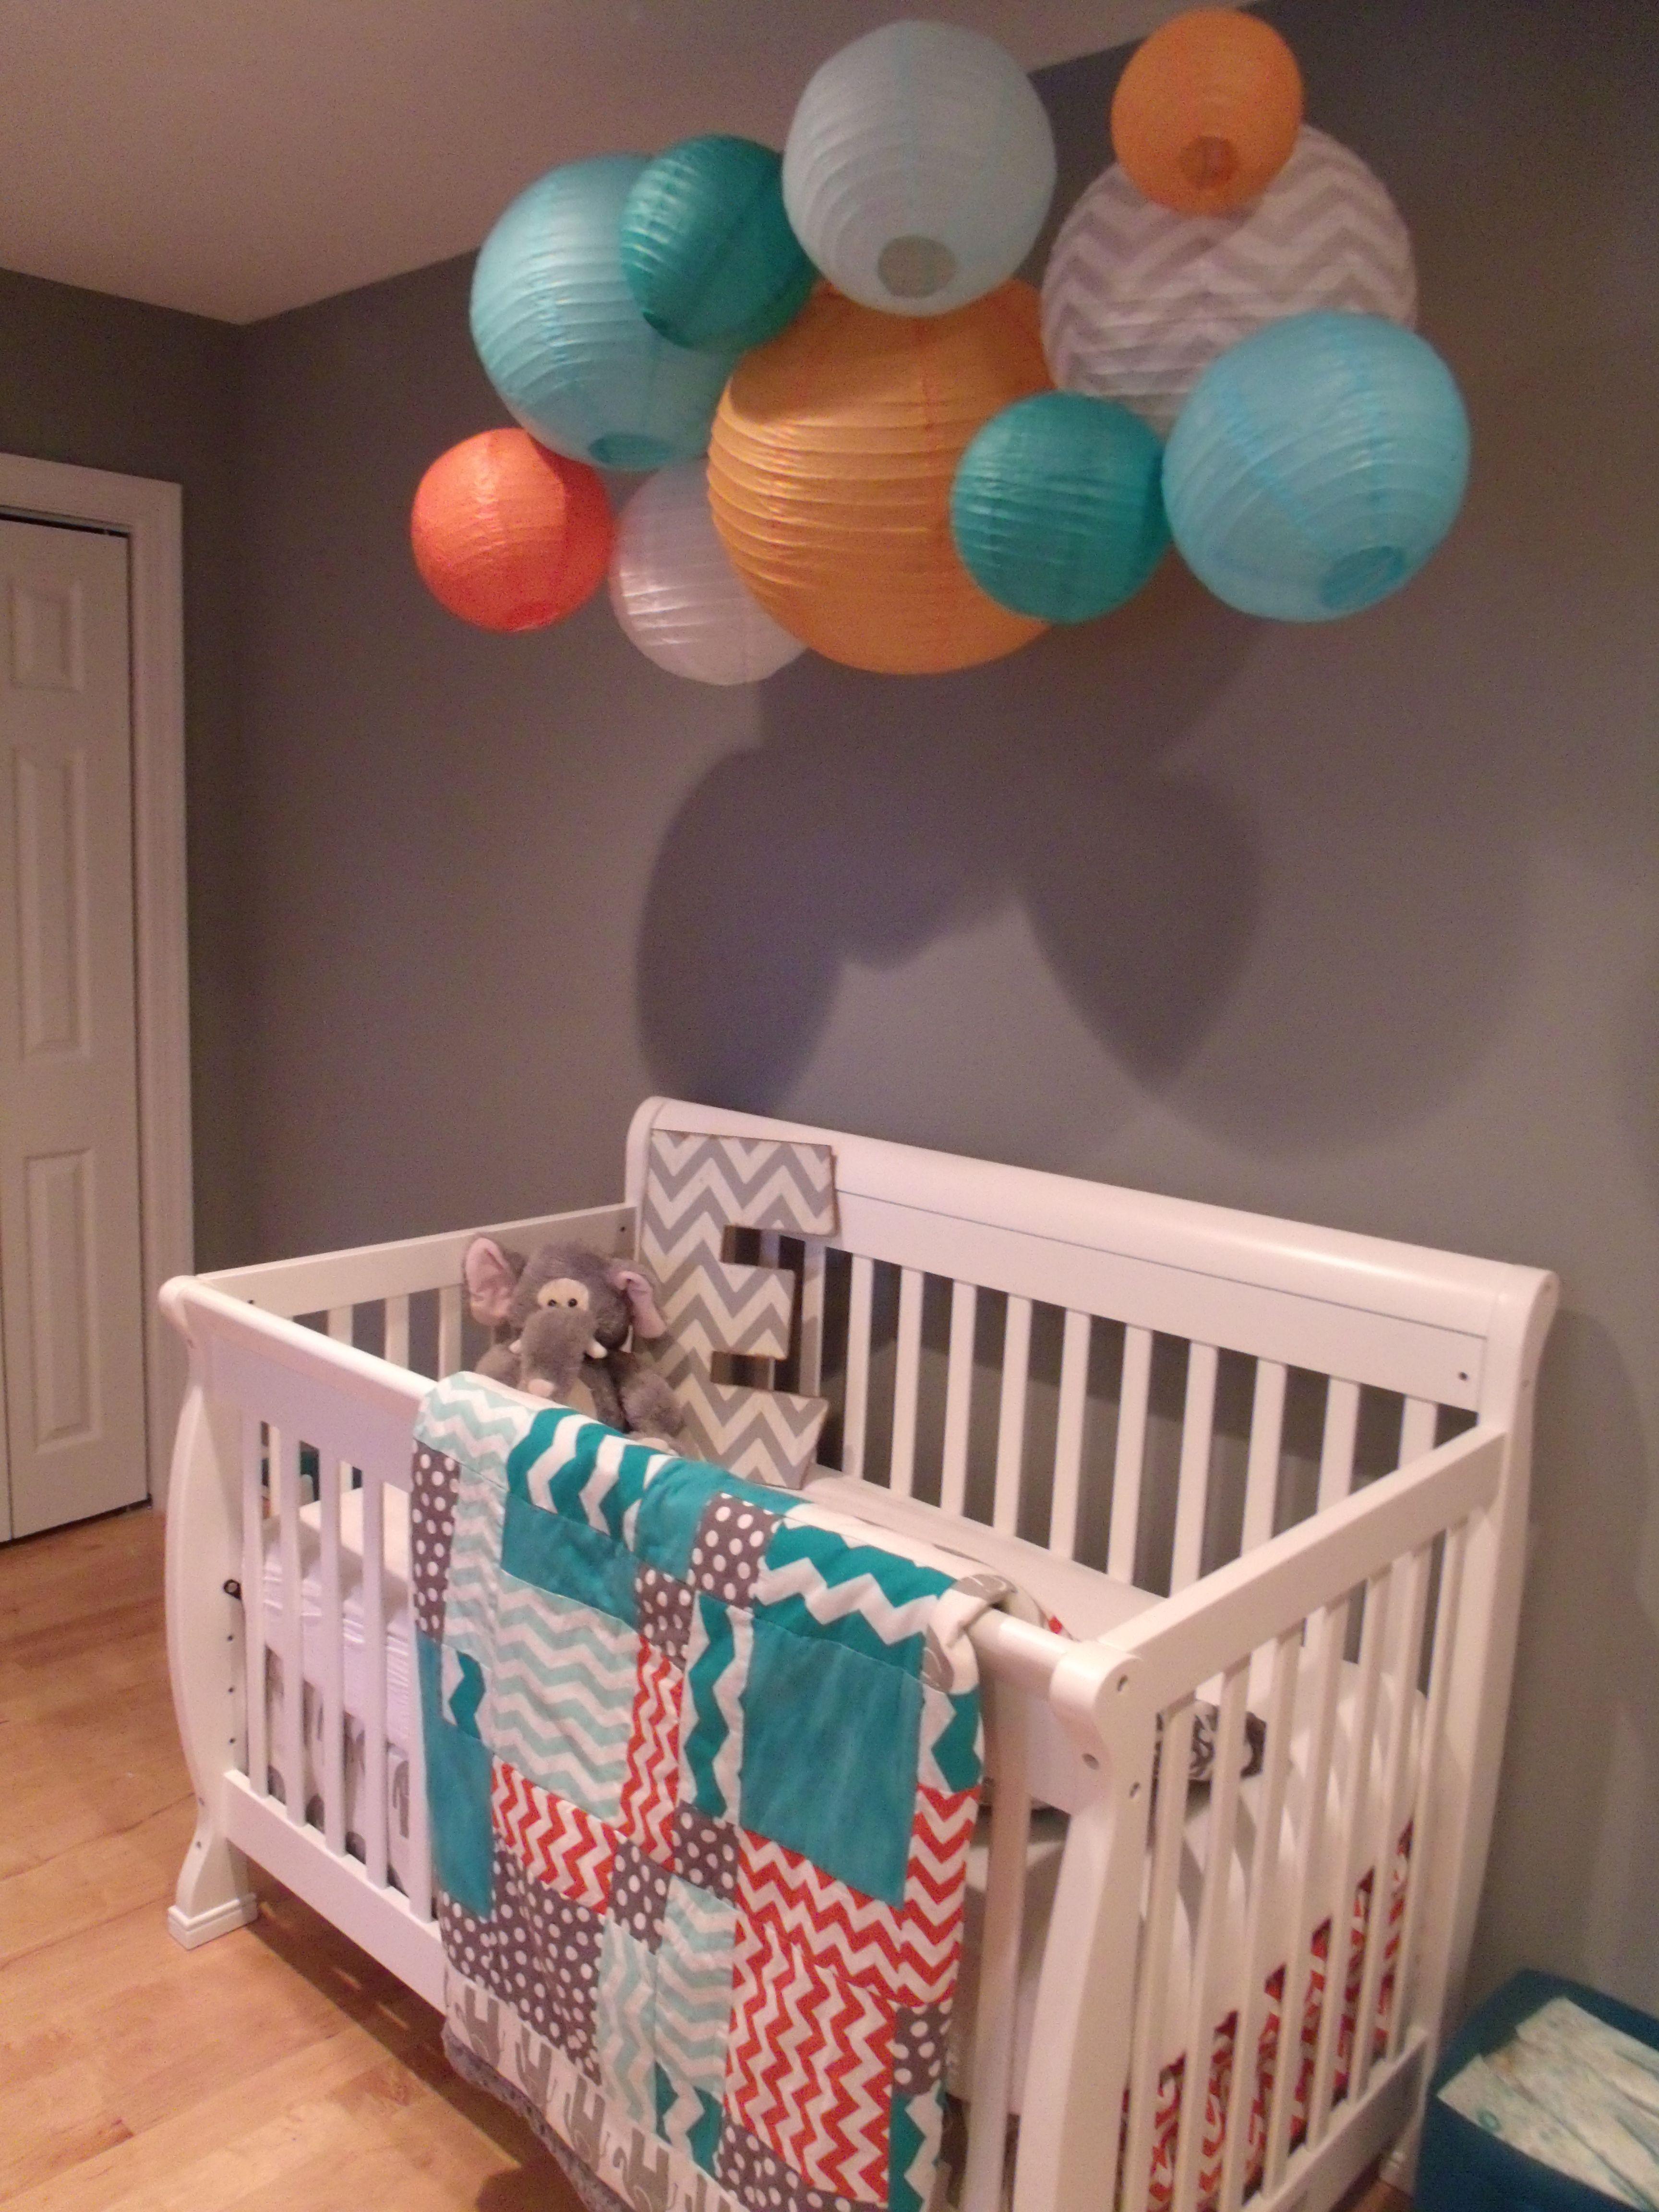 Orange Turquoise Grey Nursery For Baby Boy (Star Wars Elephants